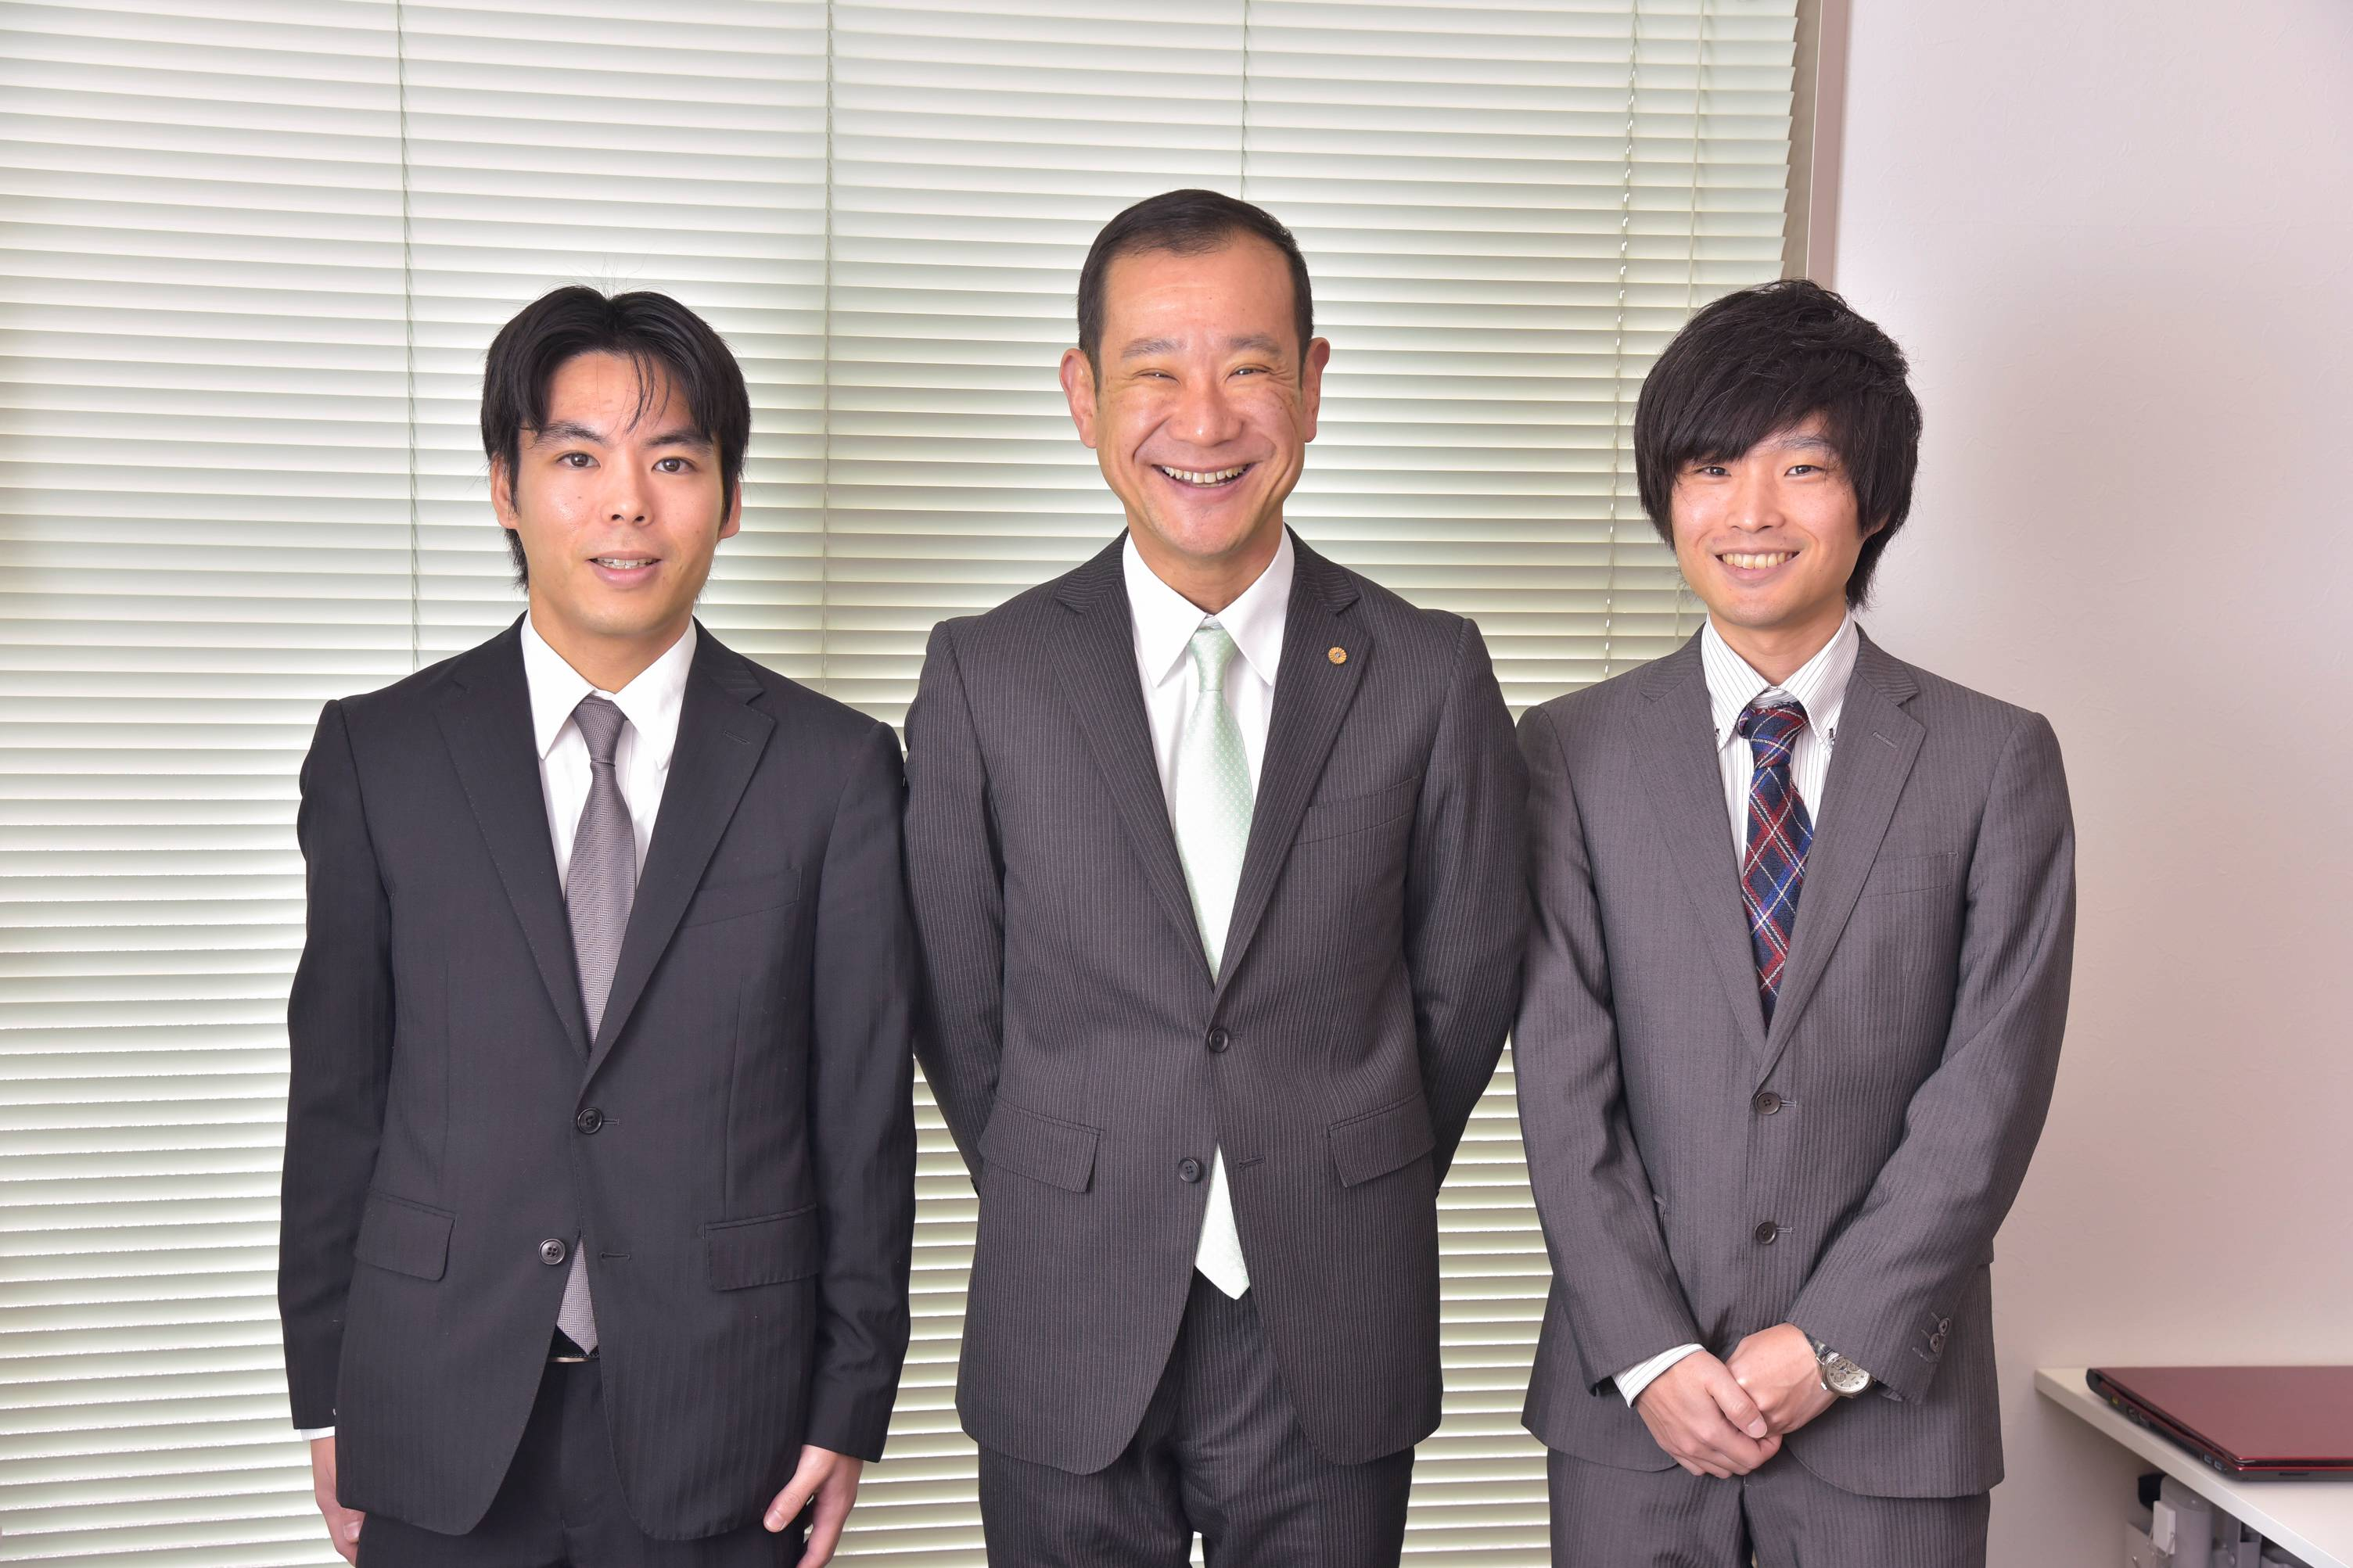 M&Nコンサルティング社会保険労務士・行政書士事務所